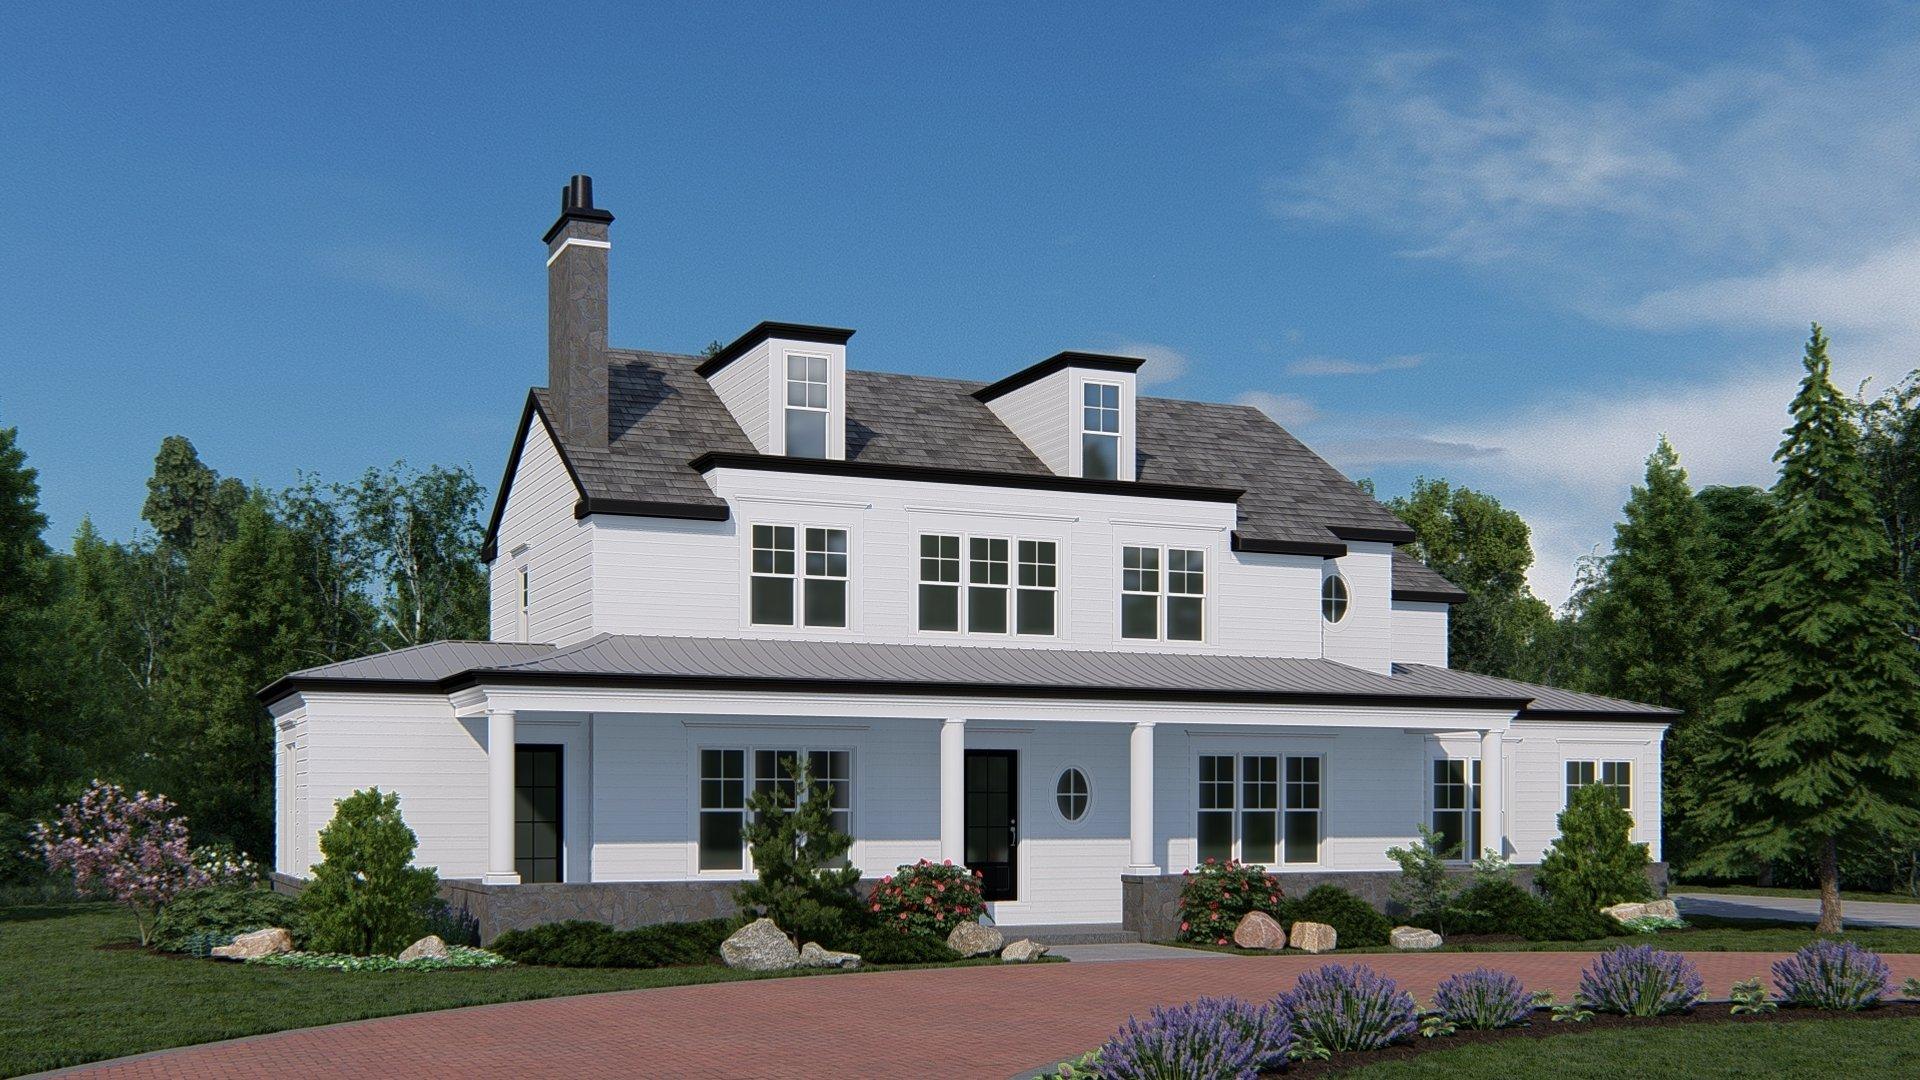 House in Winnetka, Illinois, United States 1